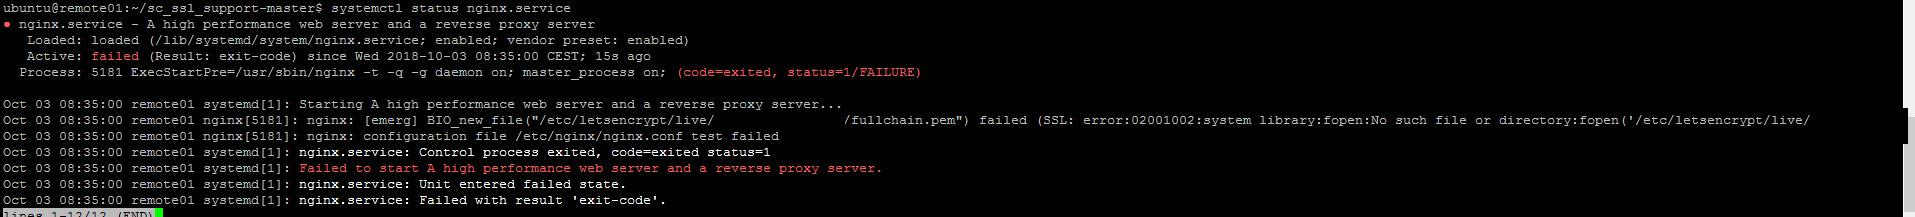 TLS 1 3 seems to breaks screenconnect when using ssl on